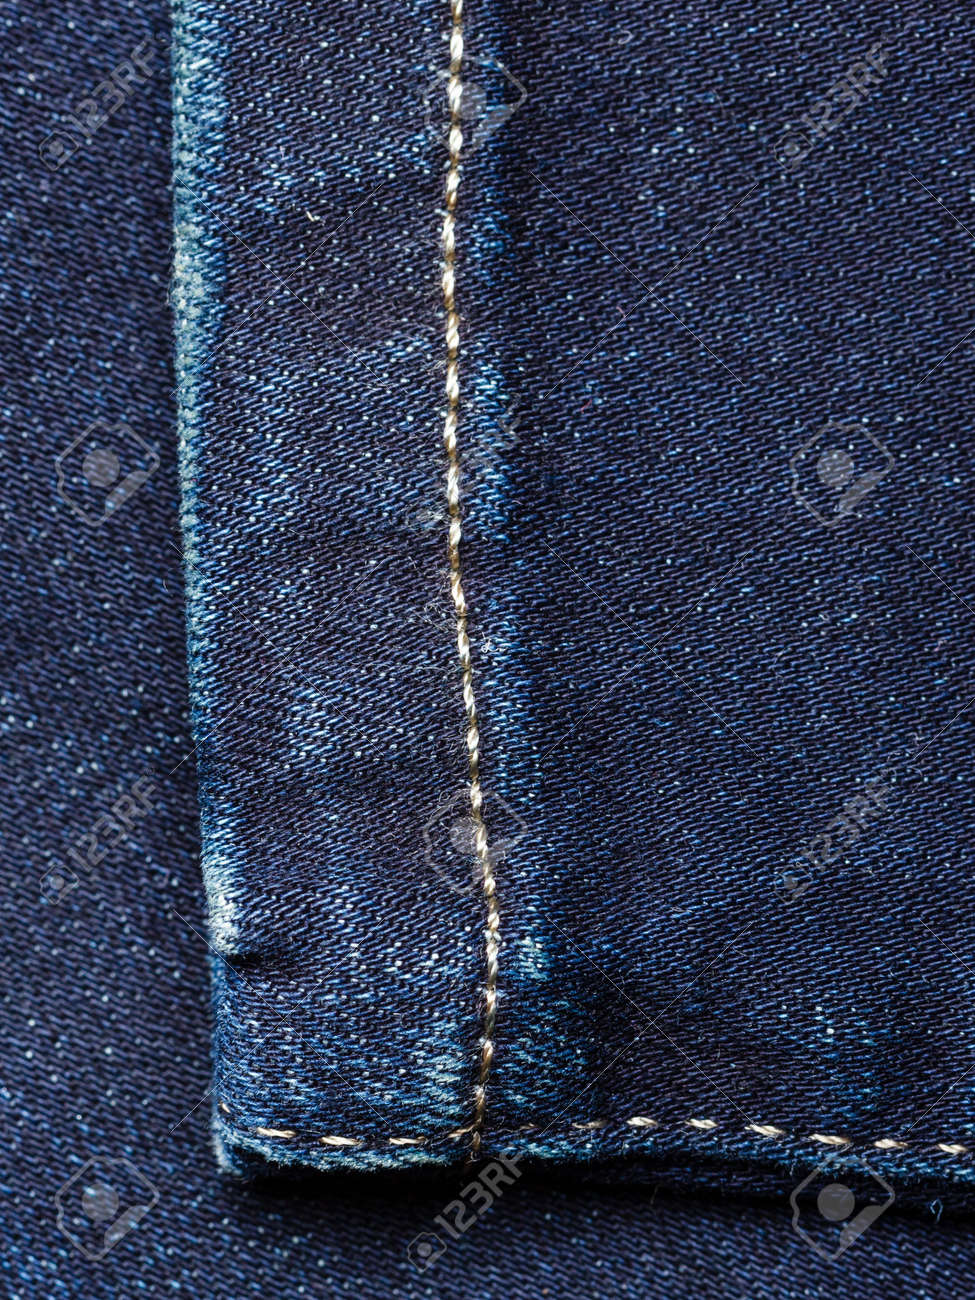 04f7cc1cb8e5 Closeup detail of blue denim jeans trouses texture background stock photo  jpg 975x1300 Detail blue texture